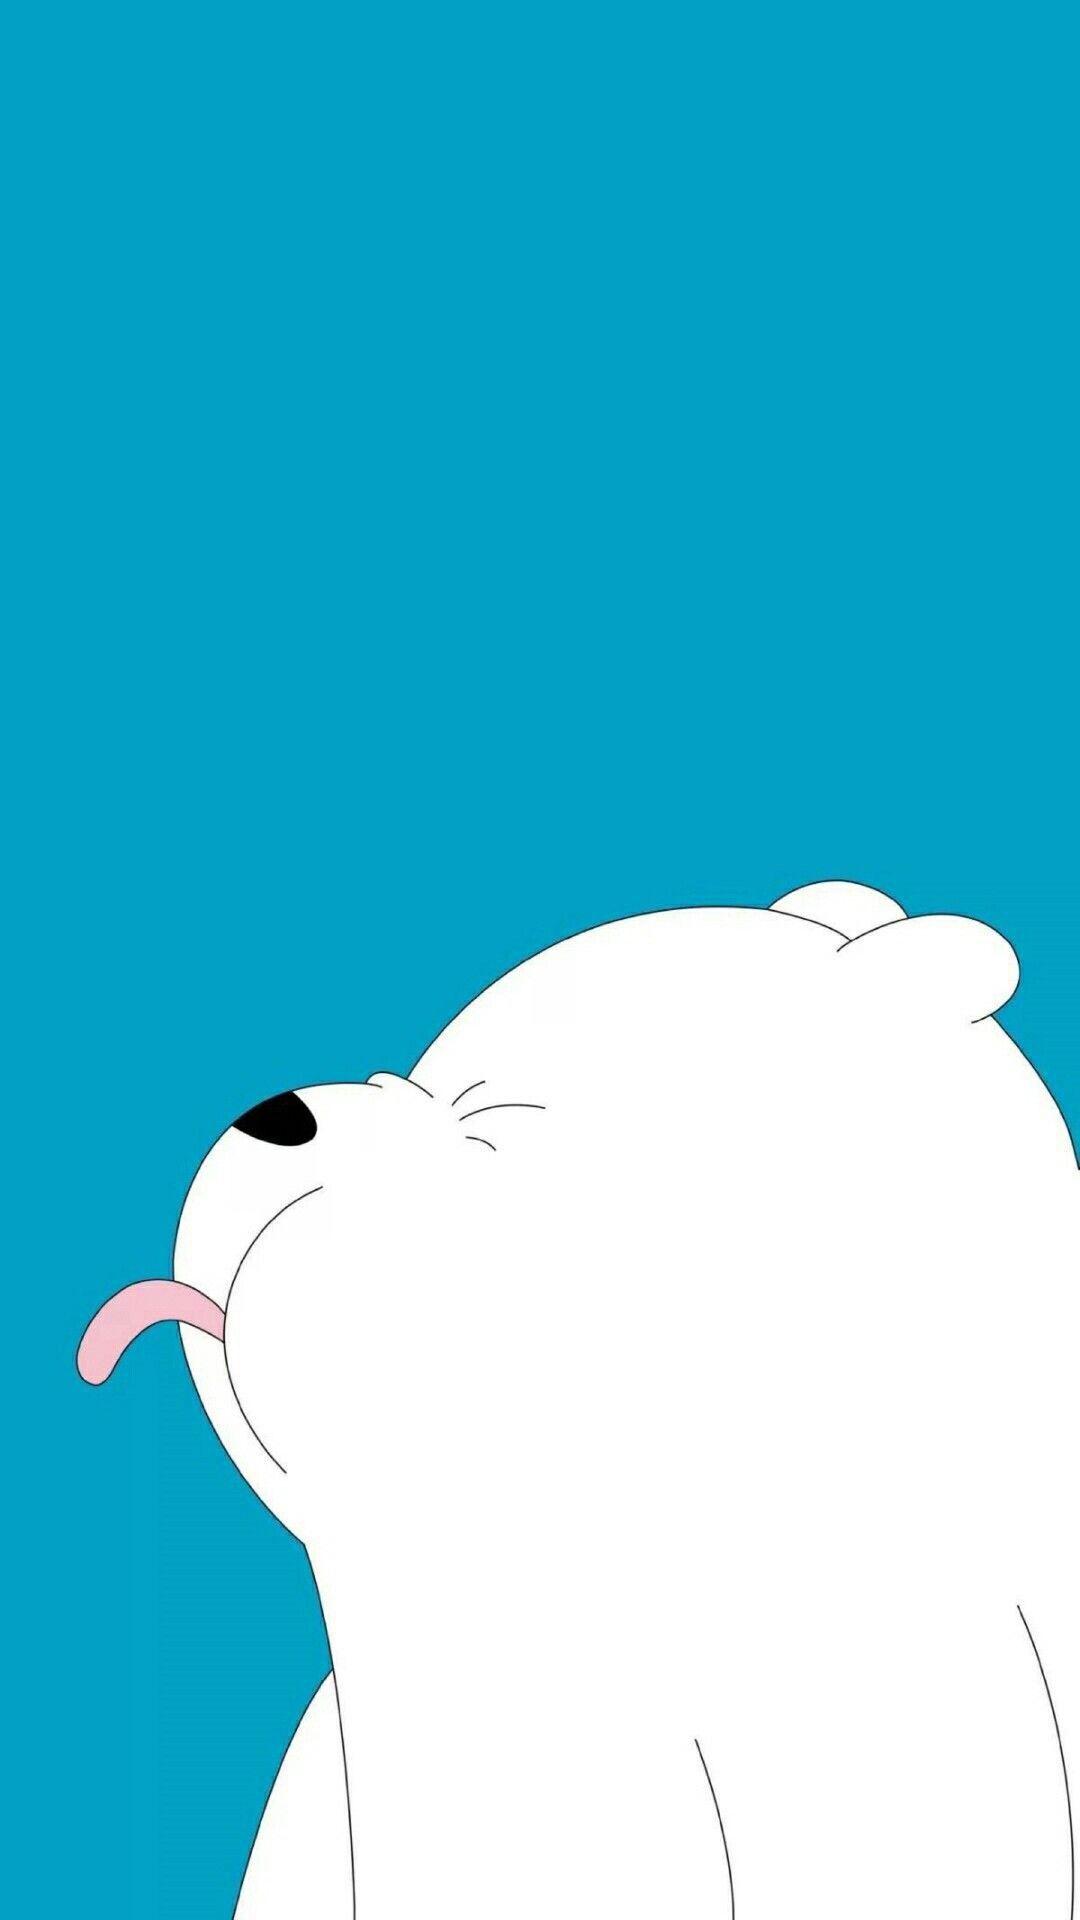 We Bare Bears Wallpaper Hd Webarebears Wallpaper Hd Bears Movie Iphone Android Dark An In 2020 We Bare Bears Wallpapers Bear Wallpaper Cute Cartoon Wallpapers